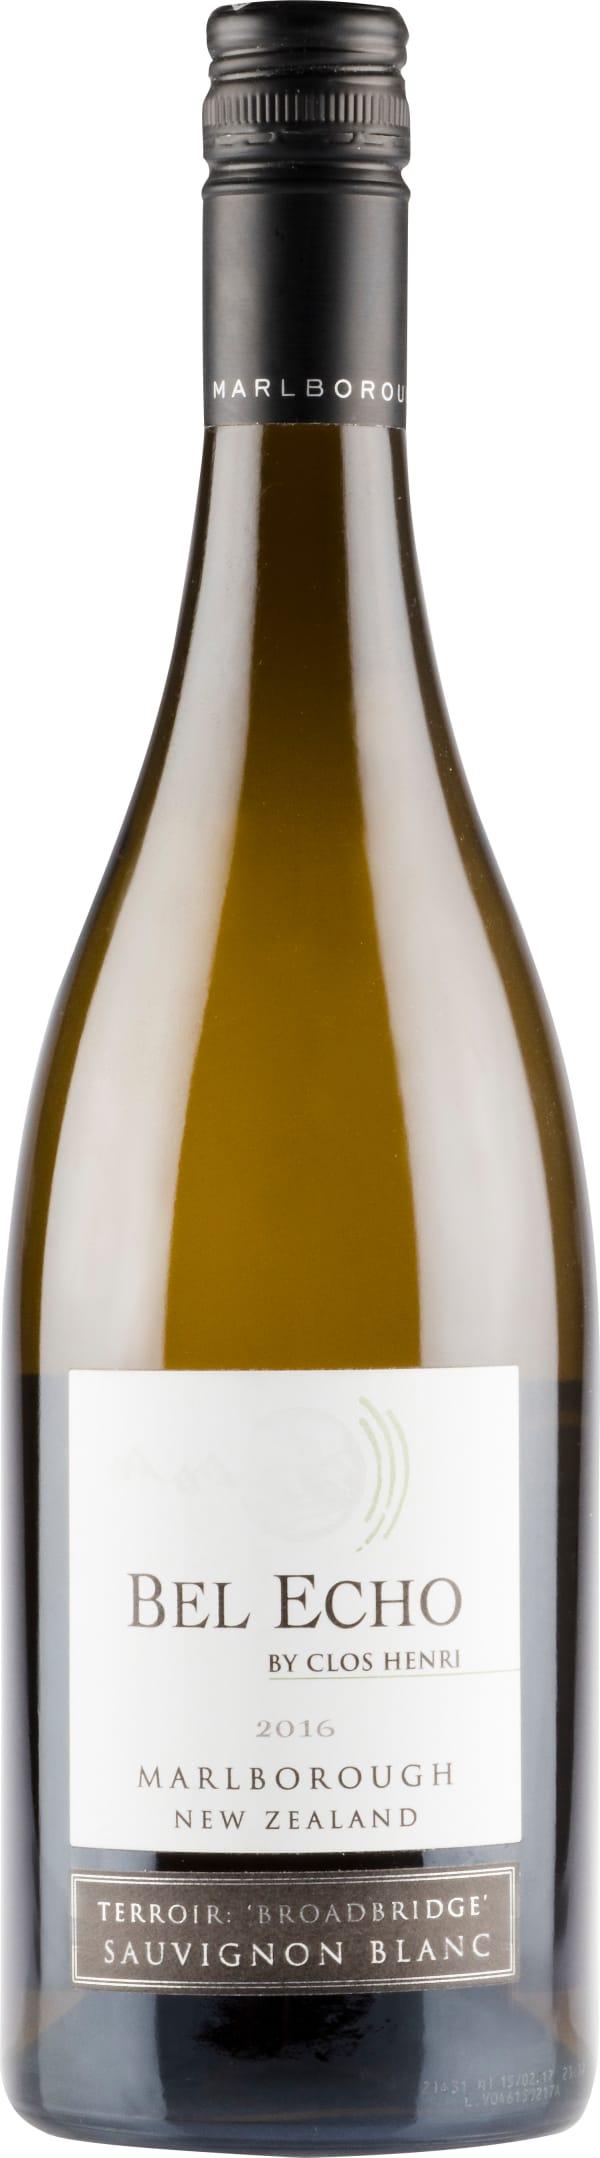 Bel Echo by Clos Henri Terroir Broadbridge Sauvignon Blanc 2016